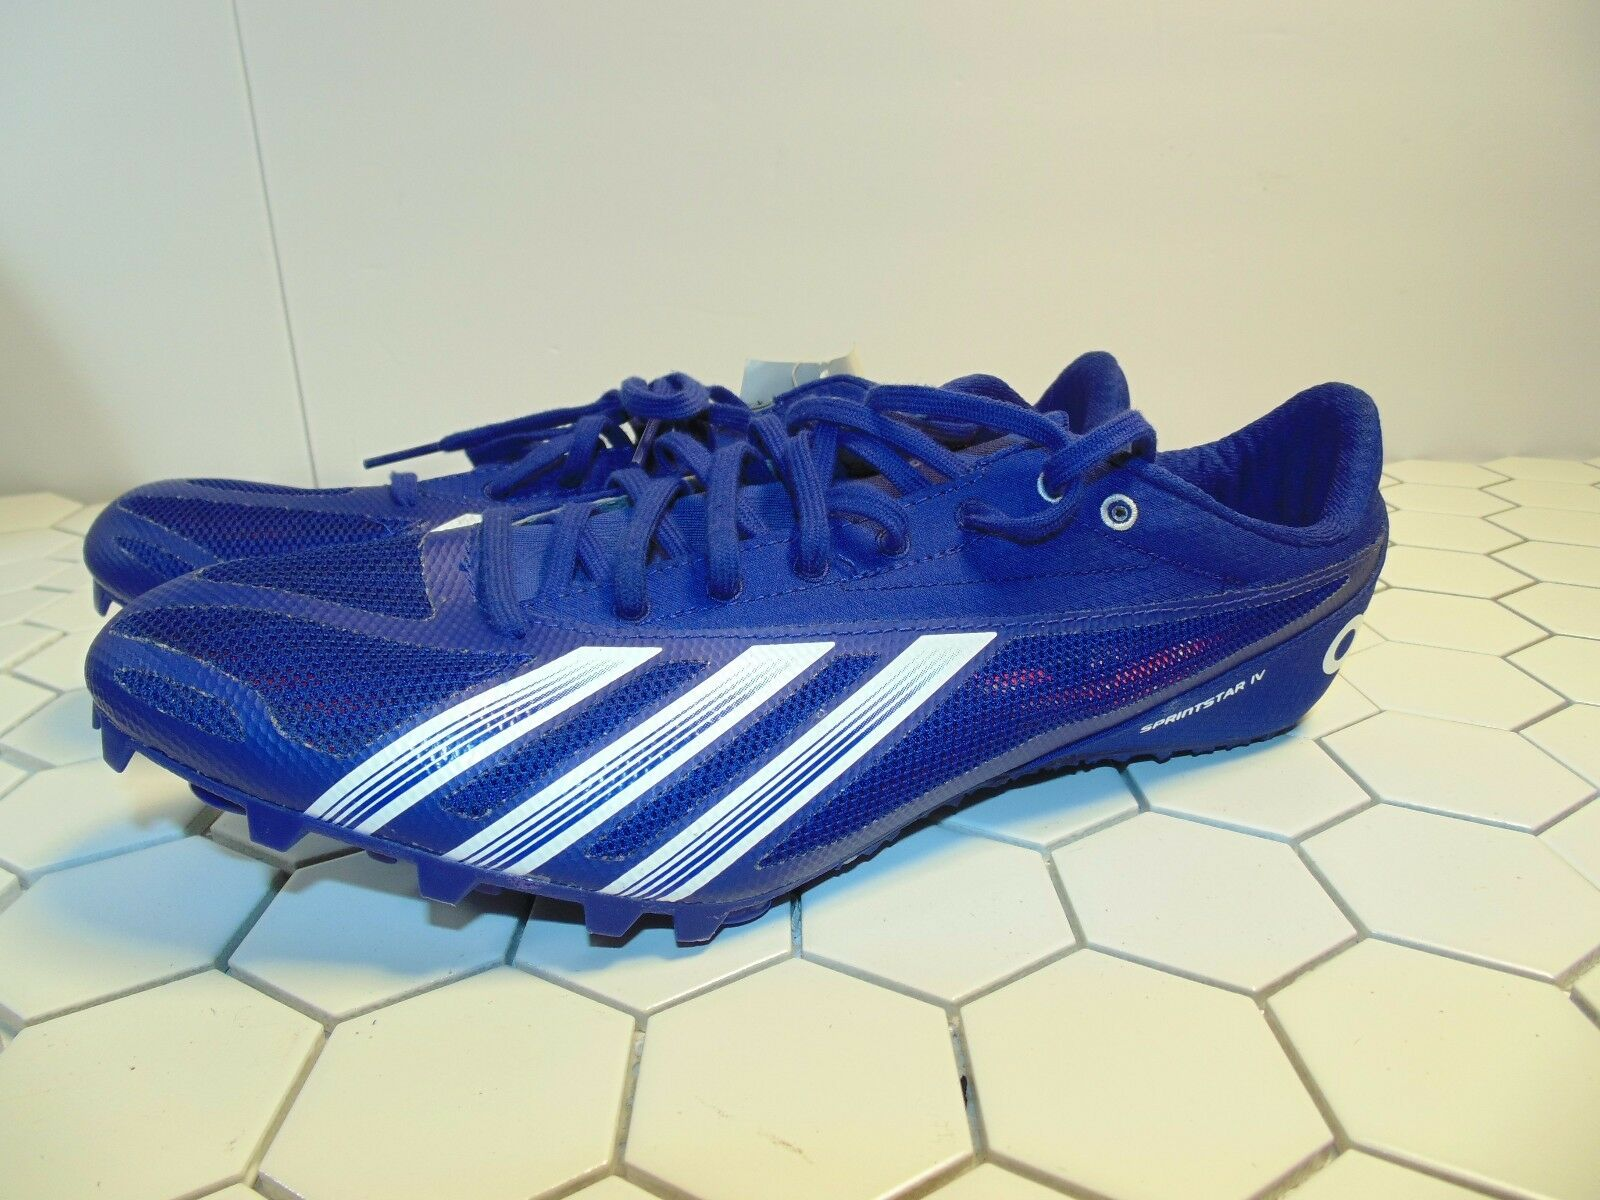 Adidas Sprint Star 4 M B40815 Blue Track & SZ Field Spikes Shoes Men's SZ & 11 7fa8cf